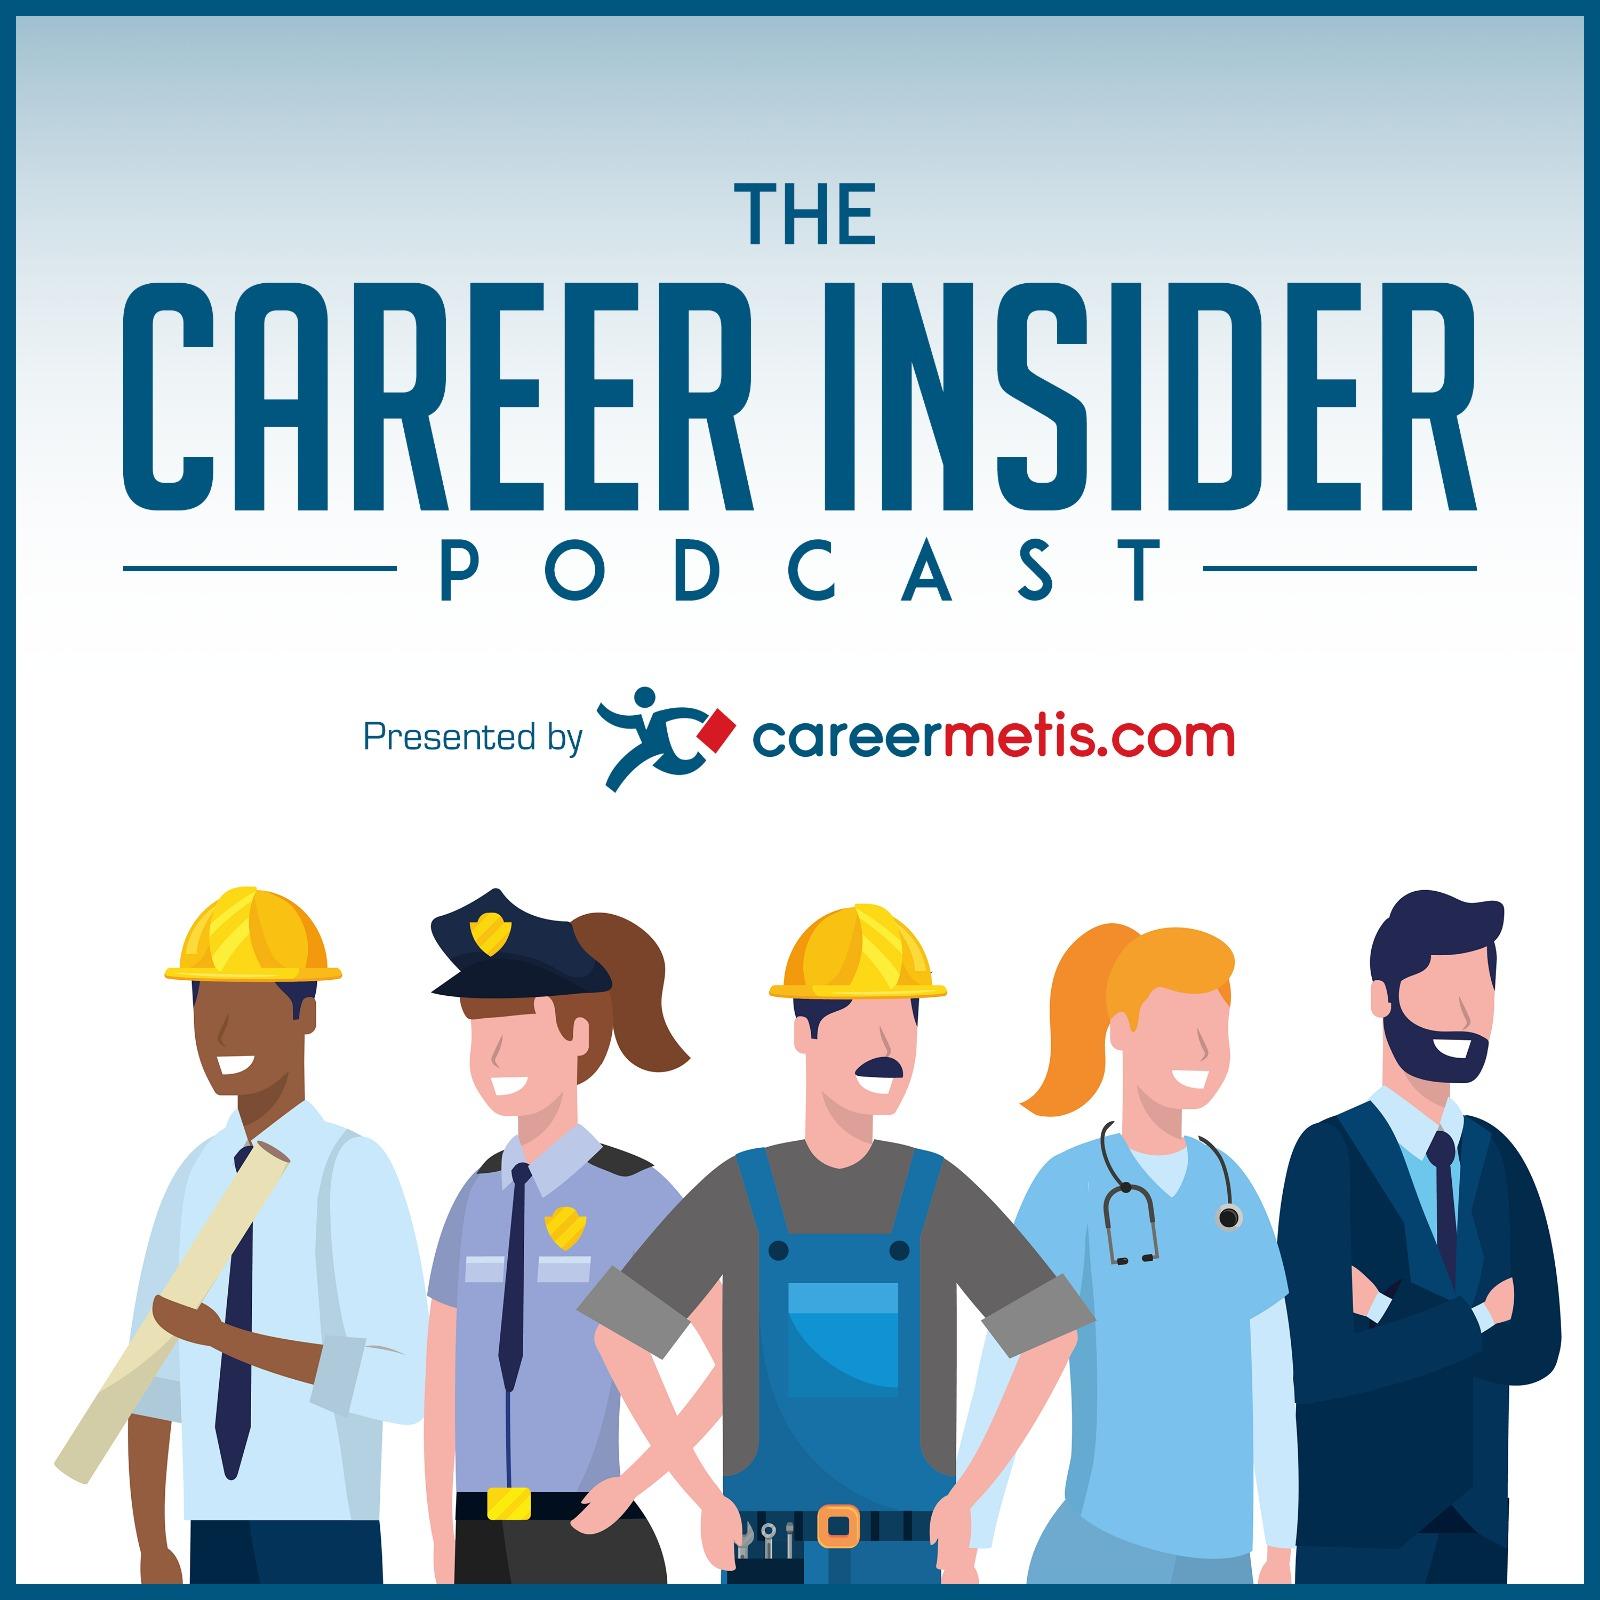 The Career Insider Podcast